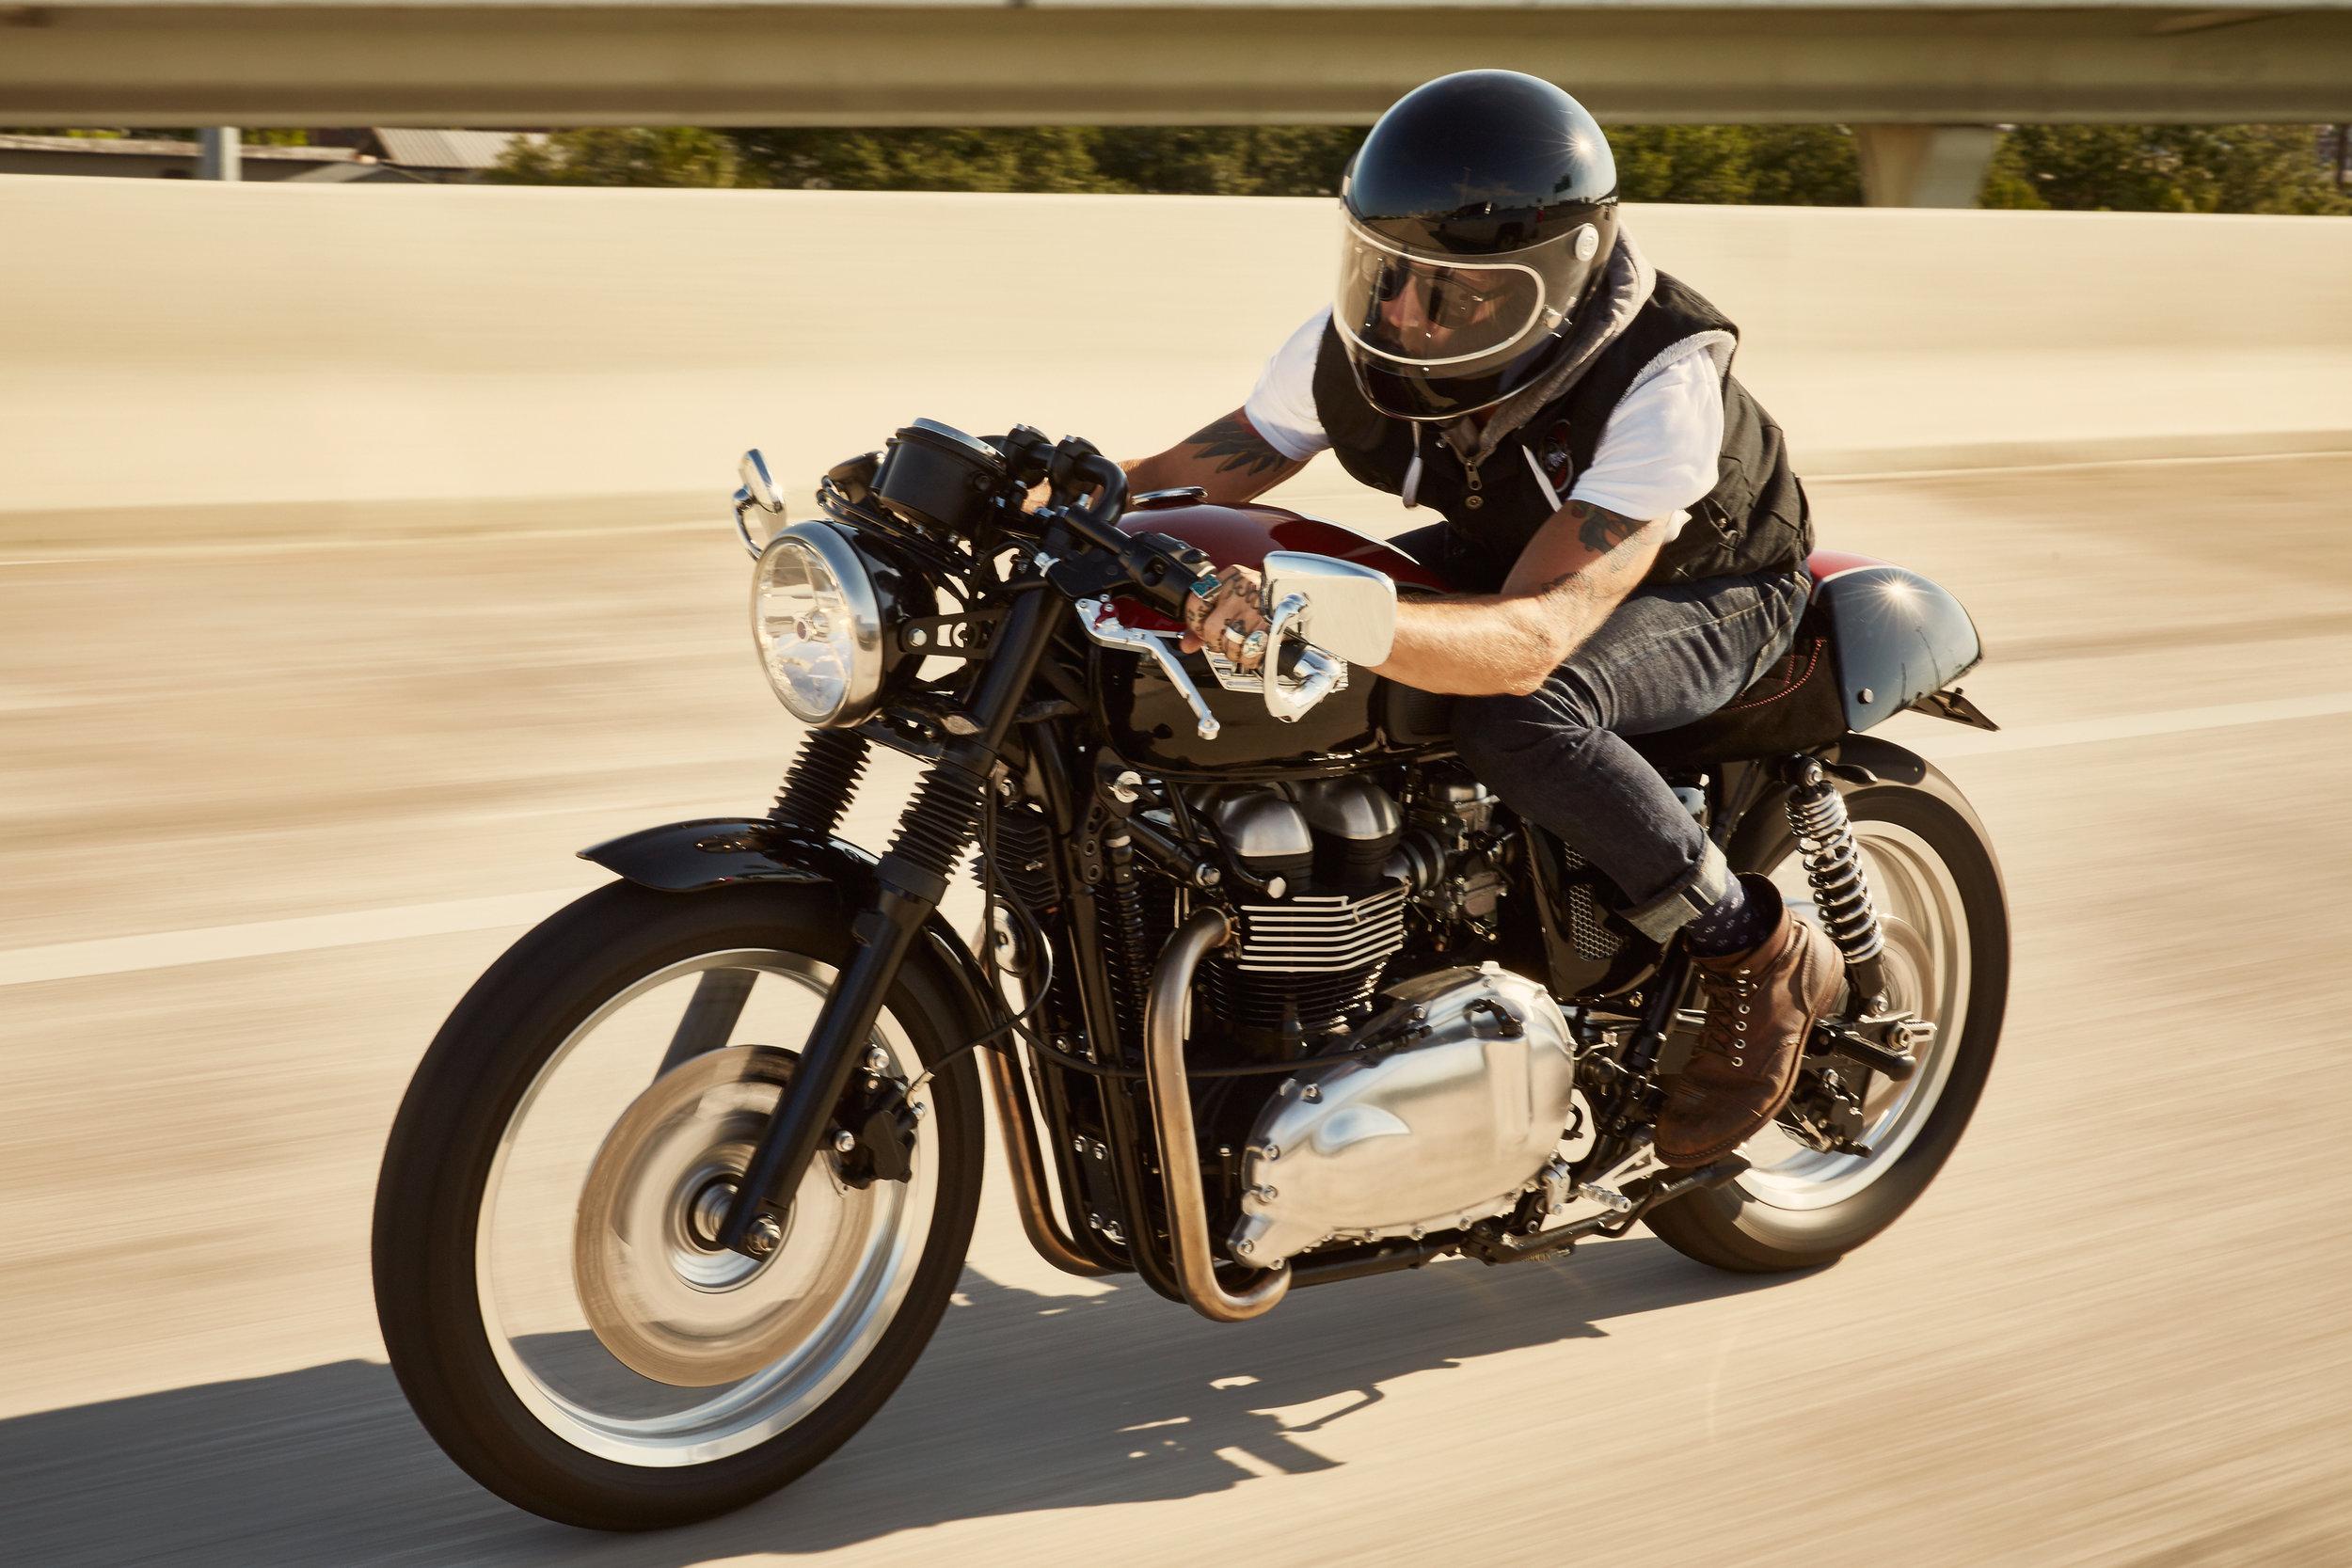 JPM_Thruxton_Riding_0015.jpg